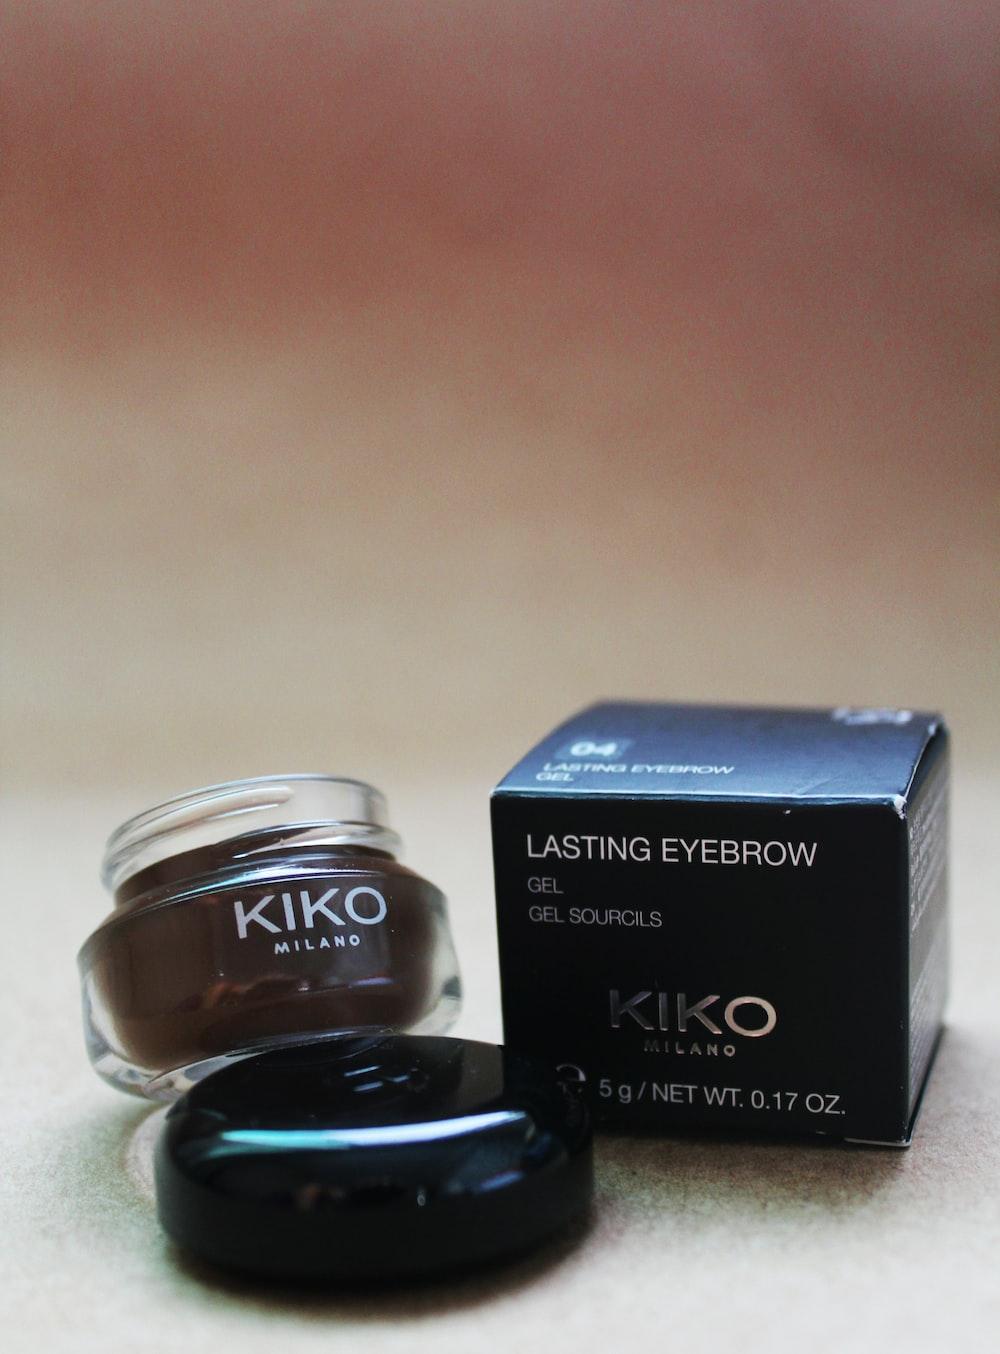 Kiko lasting eyebrow container with box